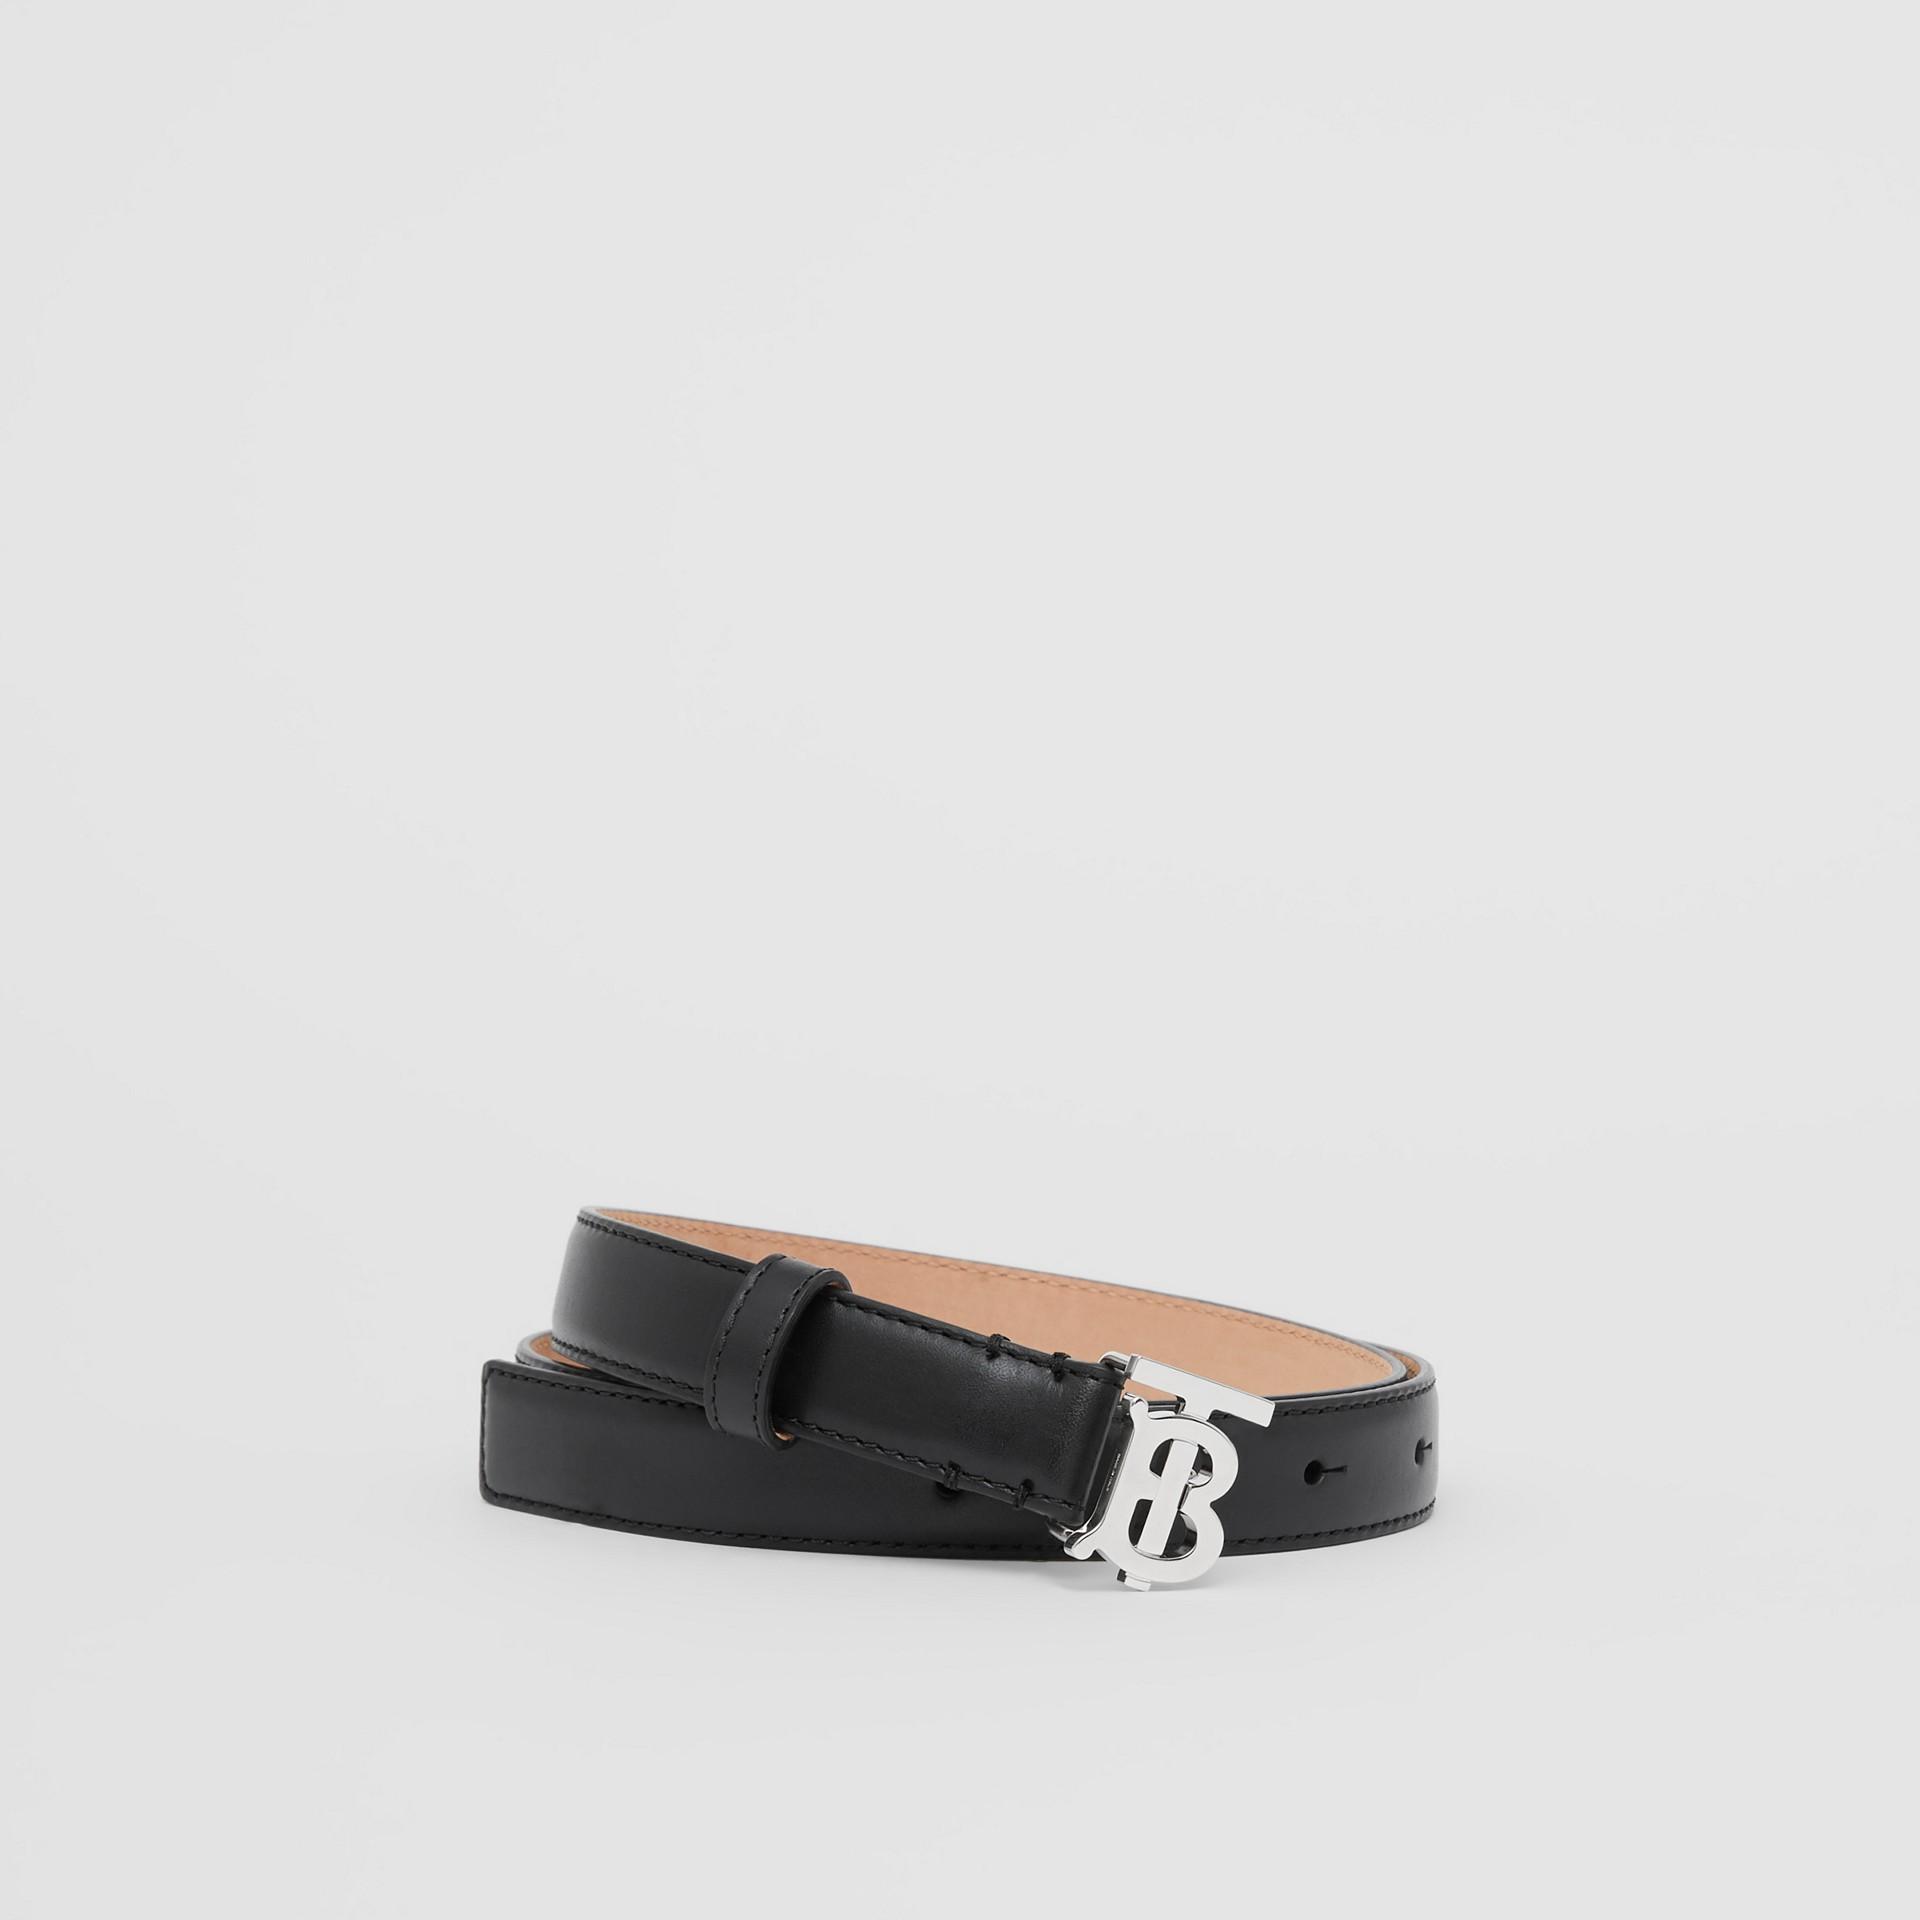 Monogram Motif Leather Belt in Black/palladio - Women | Burberry Canada - gallery image 0